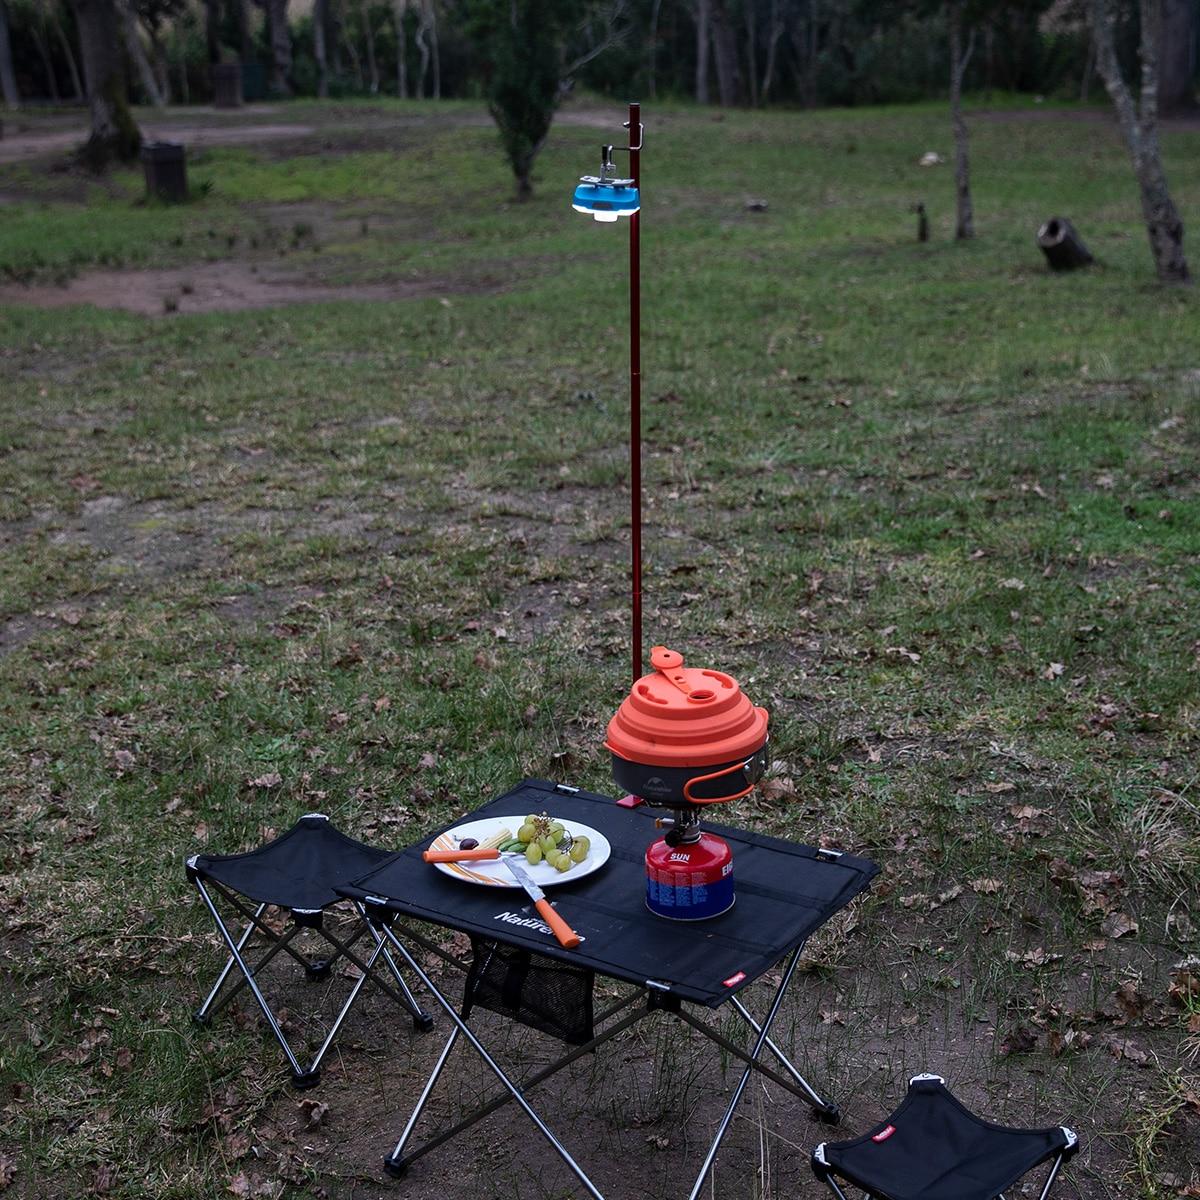 Naturehike Camping Folding Lamp Pole Portable Outdoor Picnic Travel Lightweight Aluminum Tent Light Support